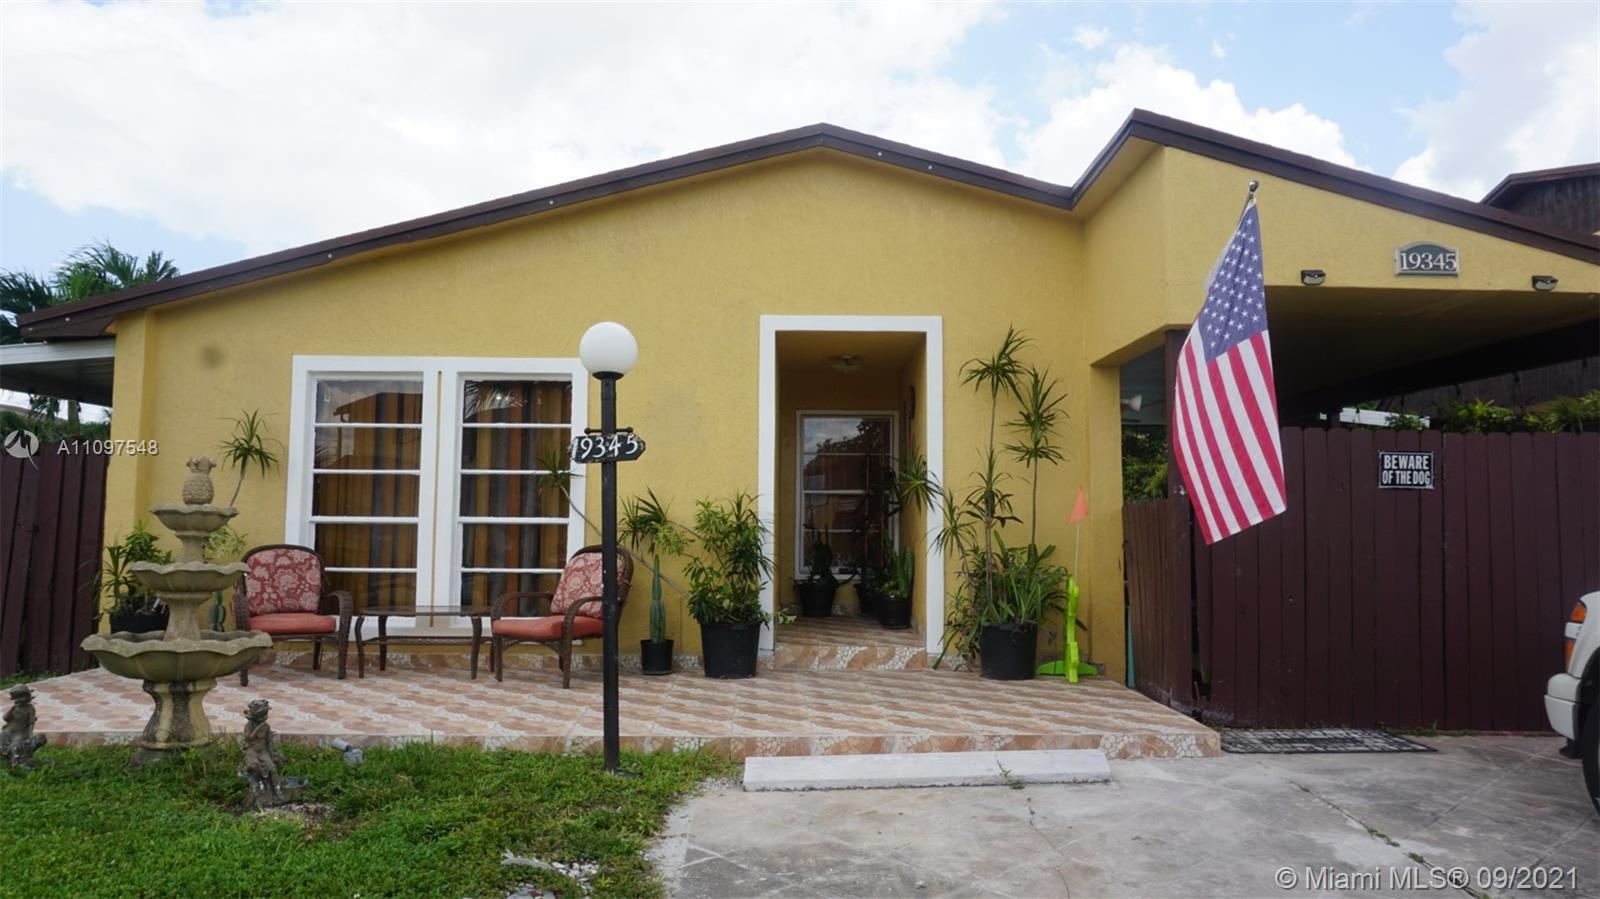 Single Family Home,For Sale,19345 NW 56th Pl, Miami Gardens, Florida 33055,Brickell,realty,broker,condos near me